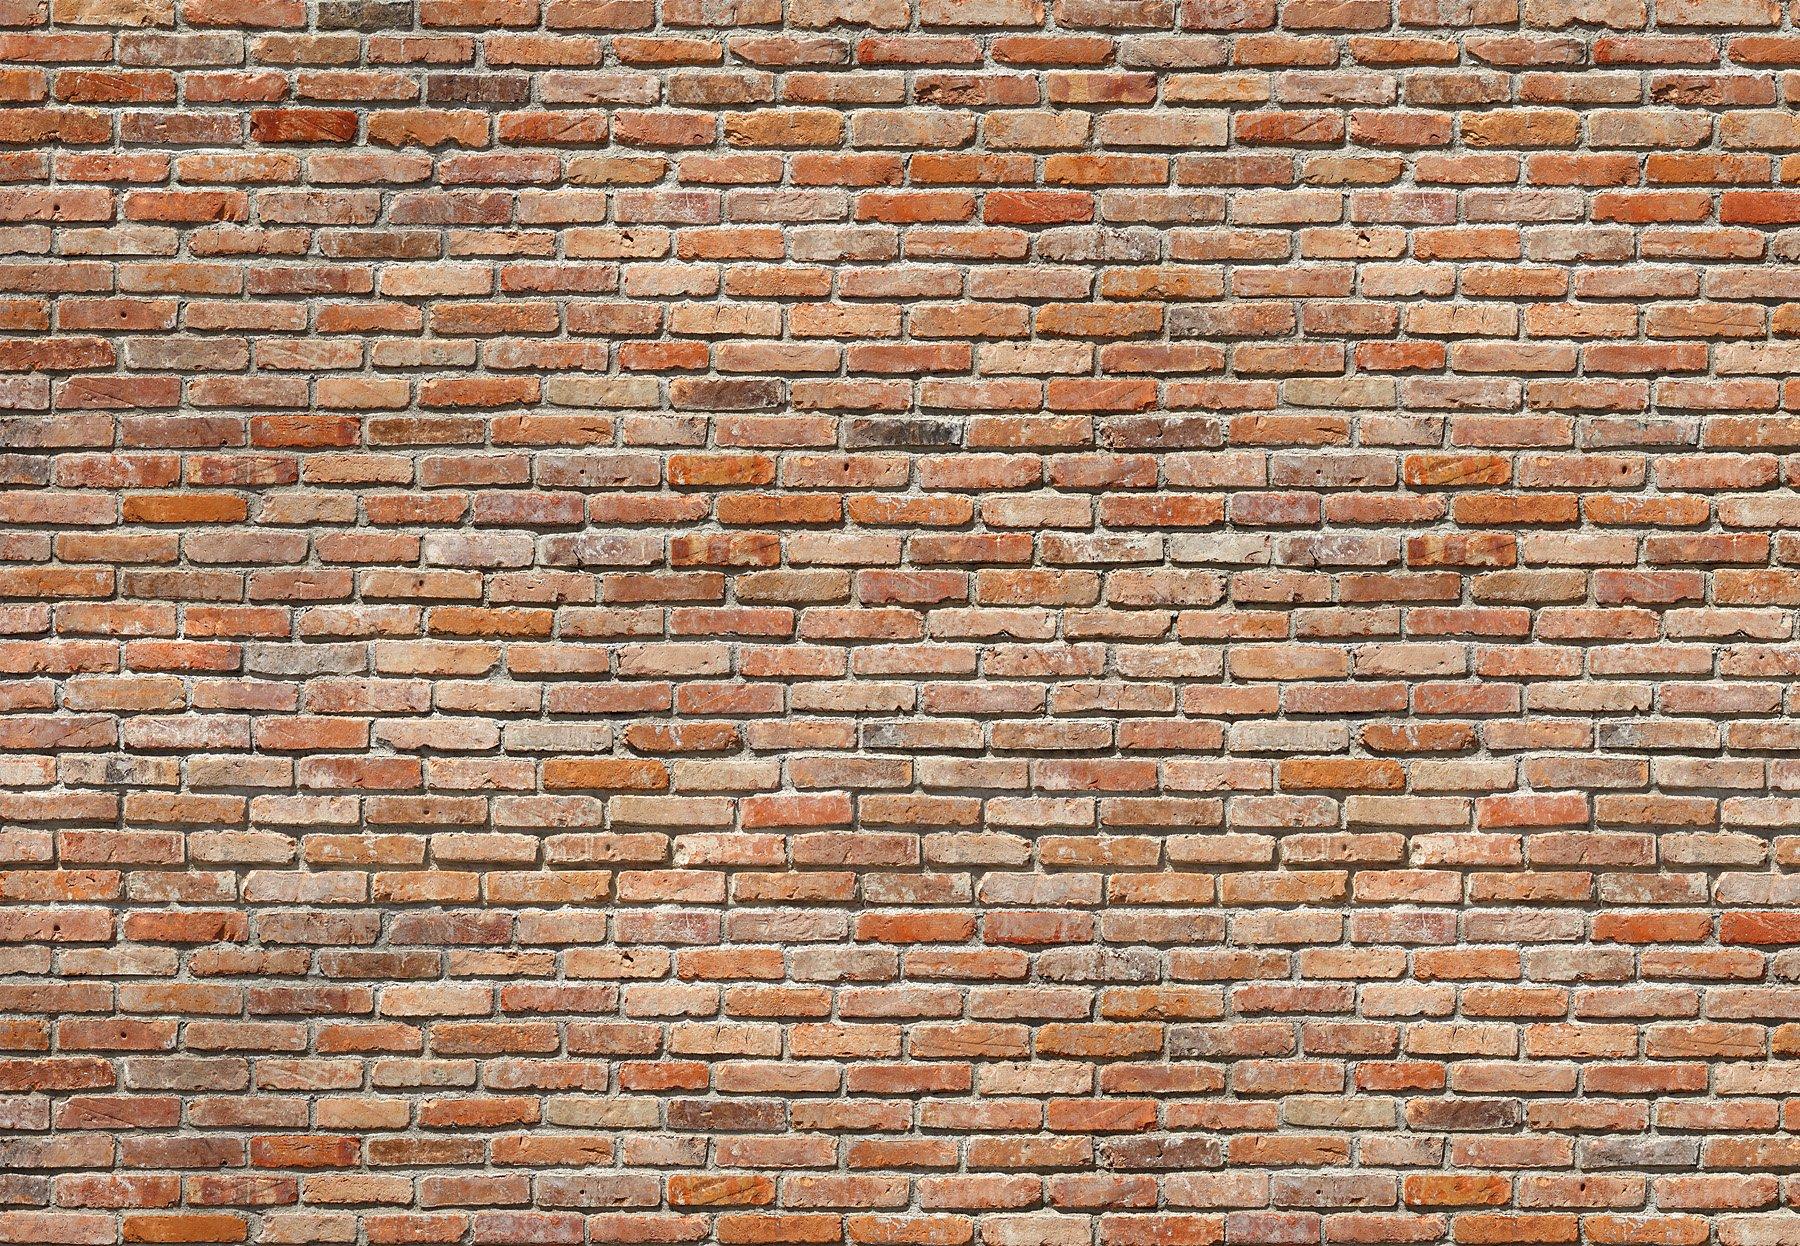 Good afternoon. Need reviews about ceramic blocks look like big bricks